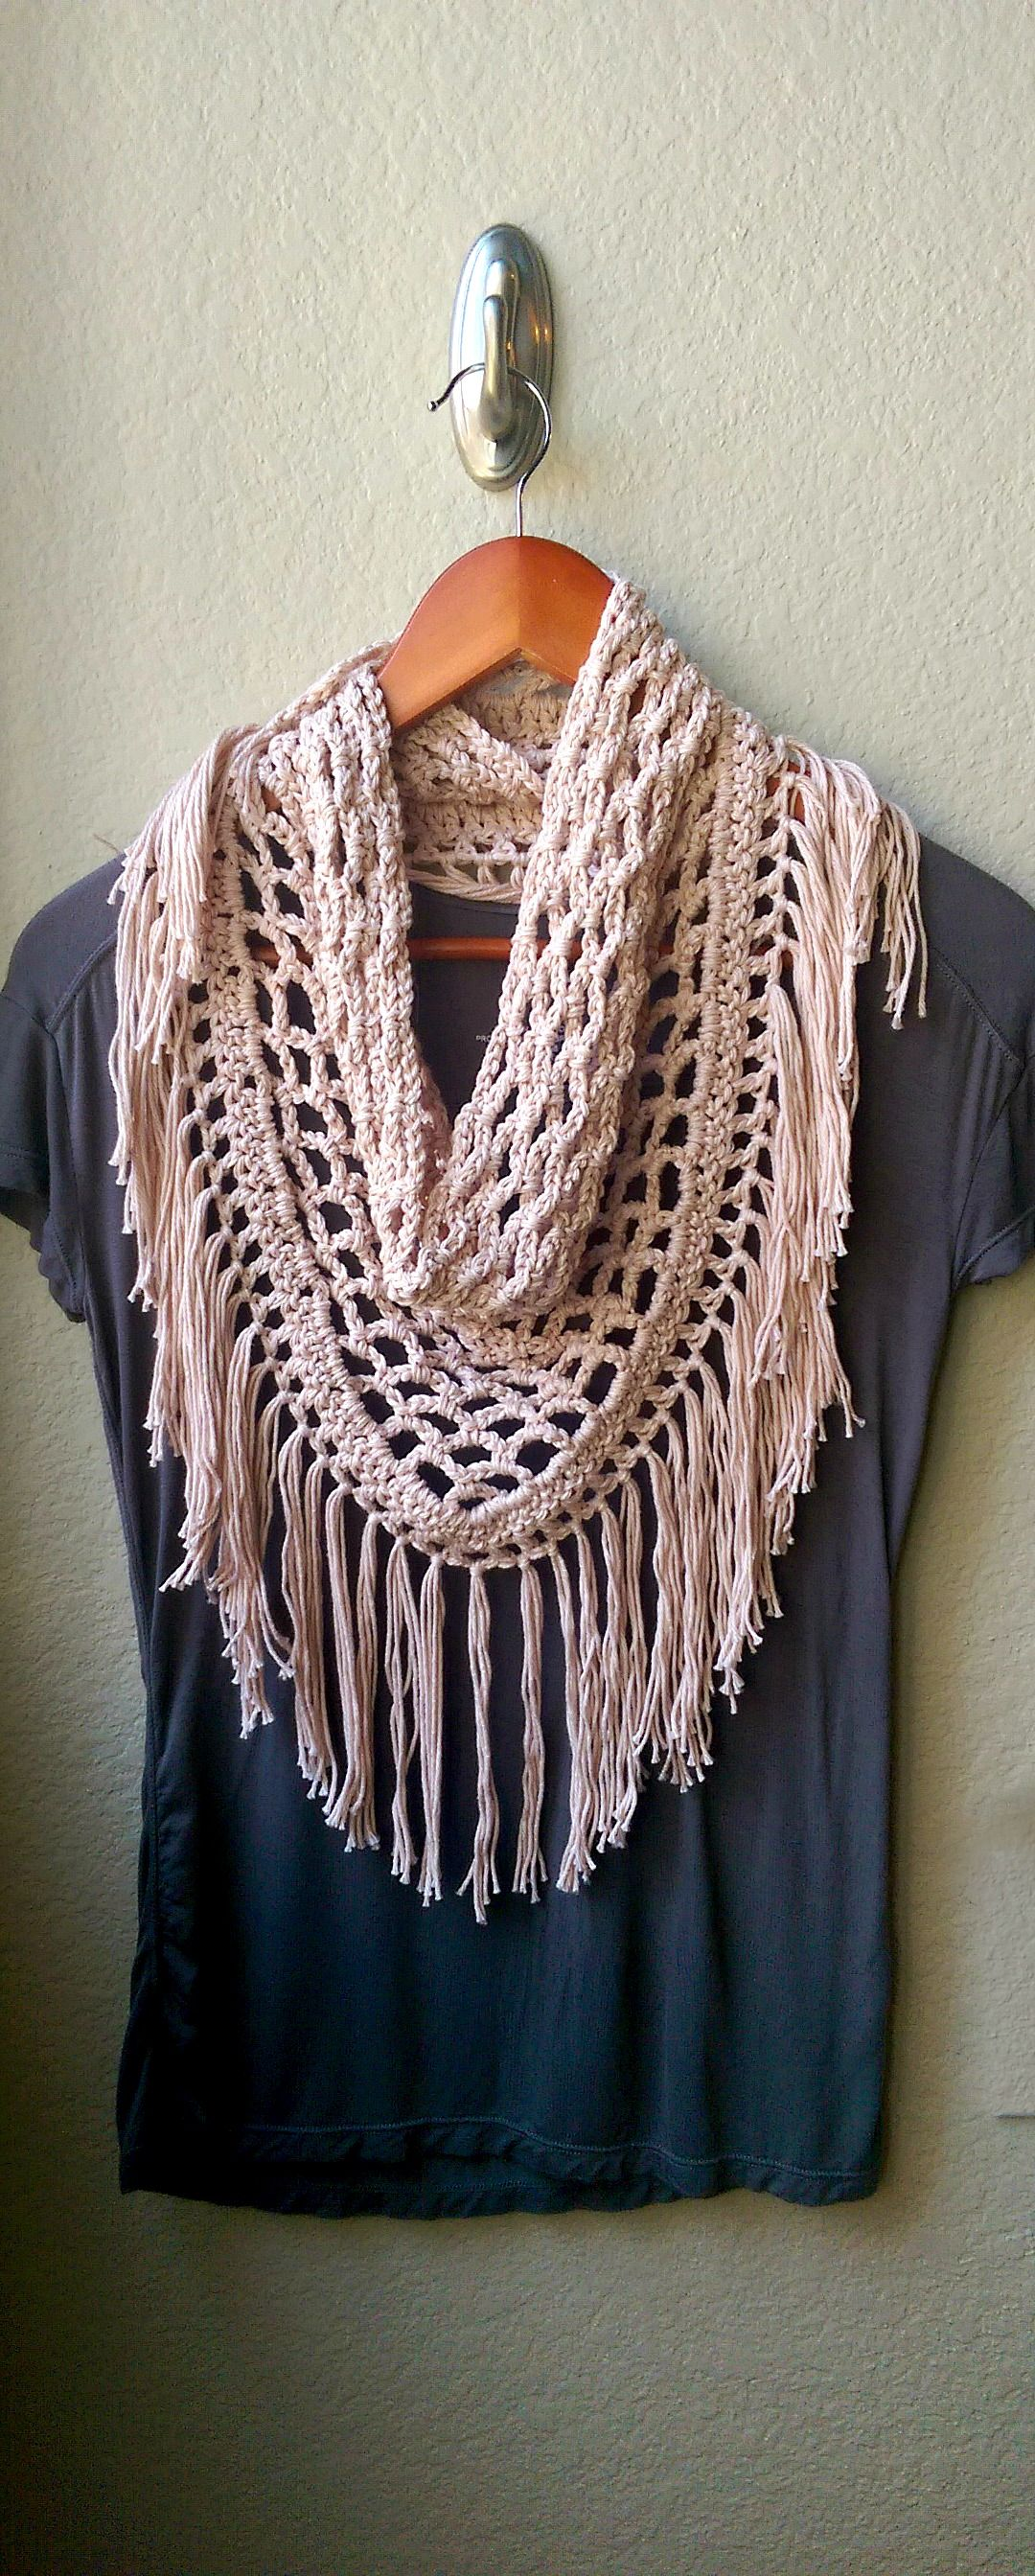 Light crochet fringe scarf pattern triangle mesh crocheted scarf light crochet fringe scarf pattern triangle mesh crocheted scarf bankloansurffo Gallery